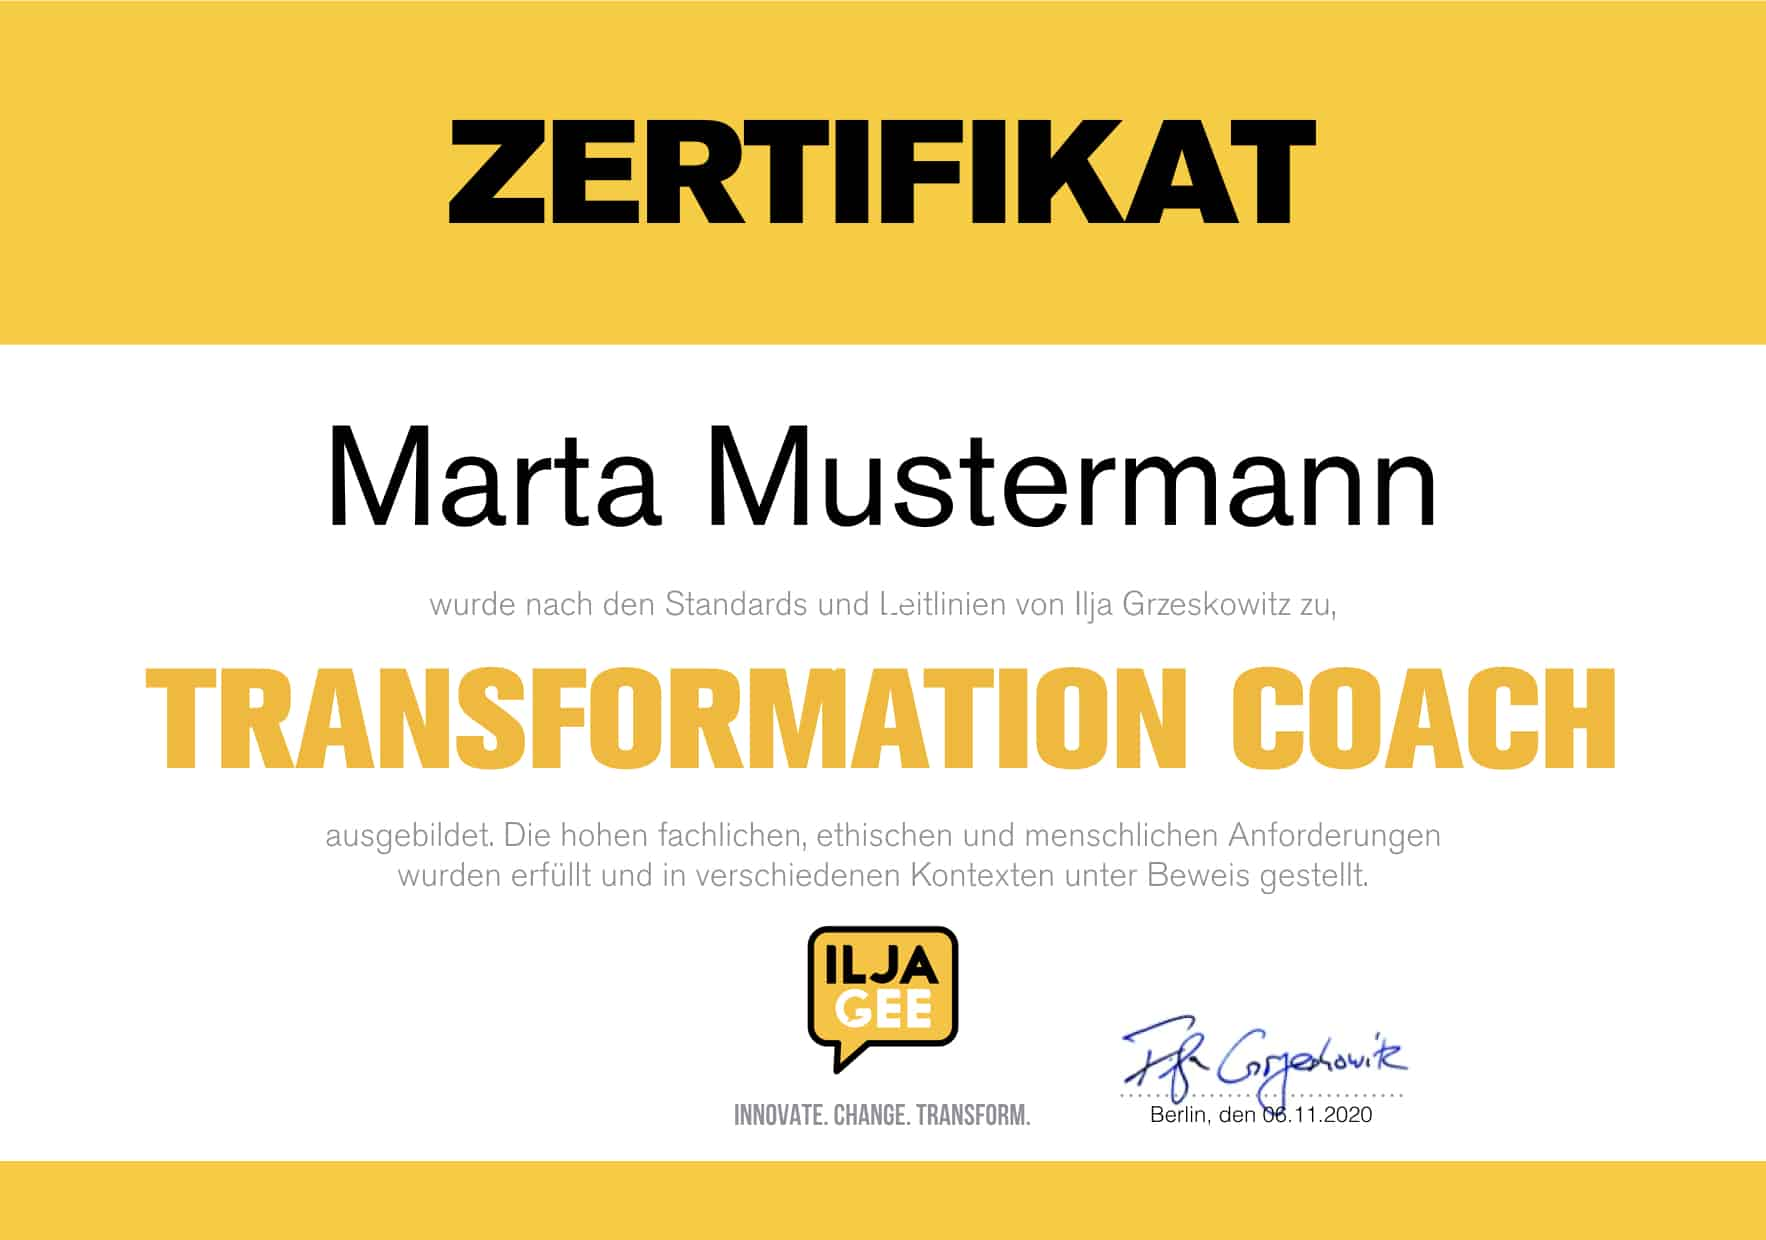 Zertifikat coaching ausbildung